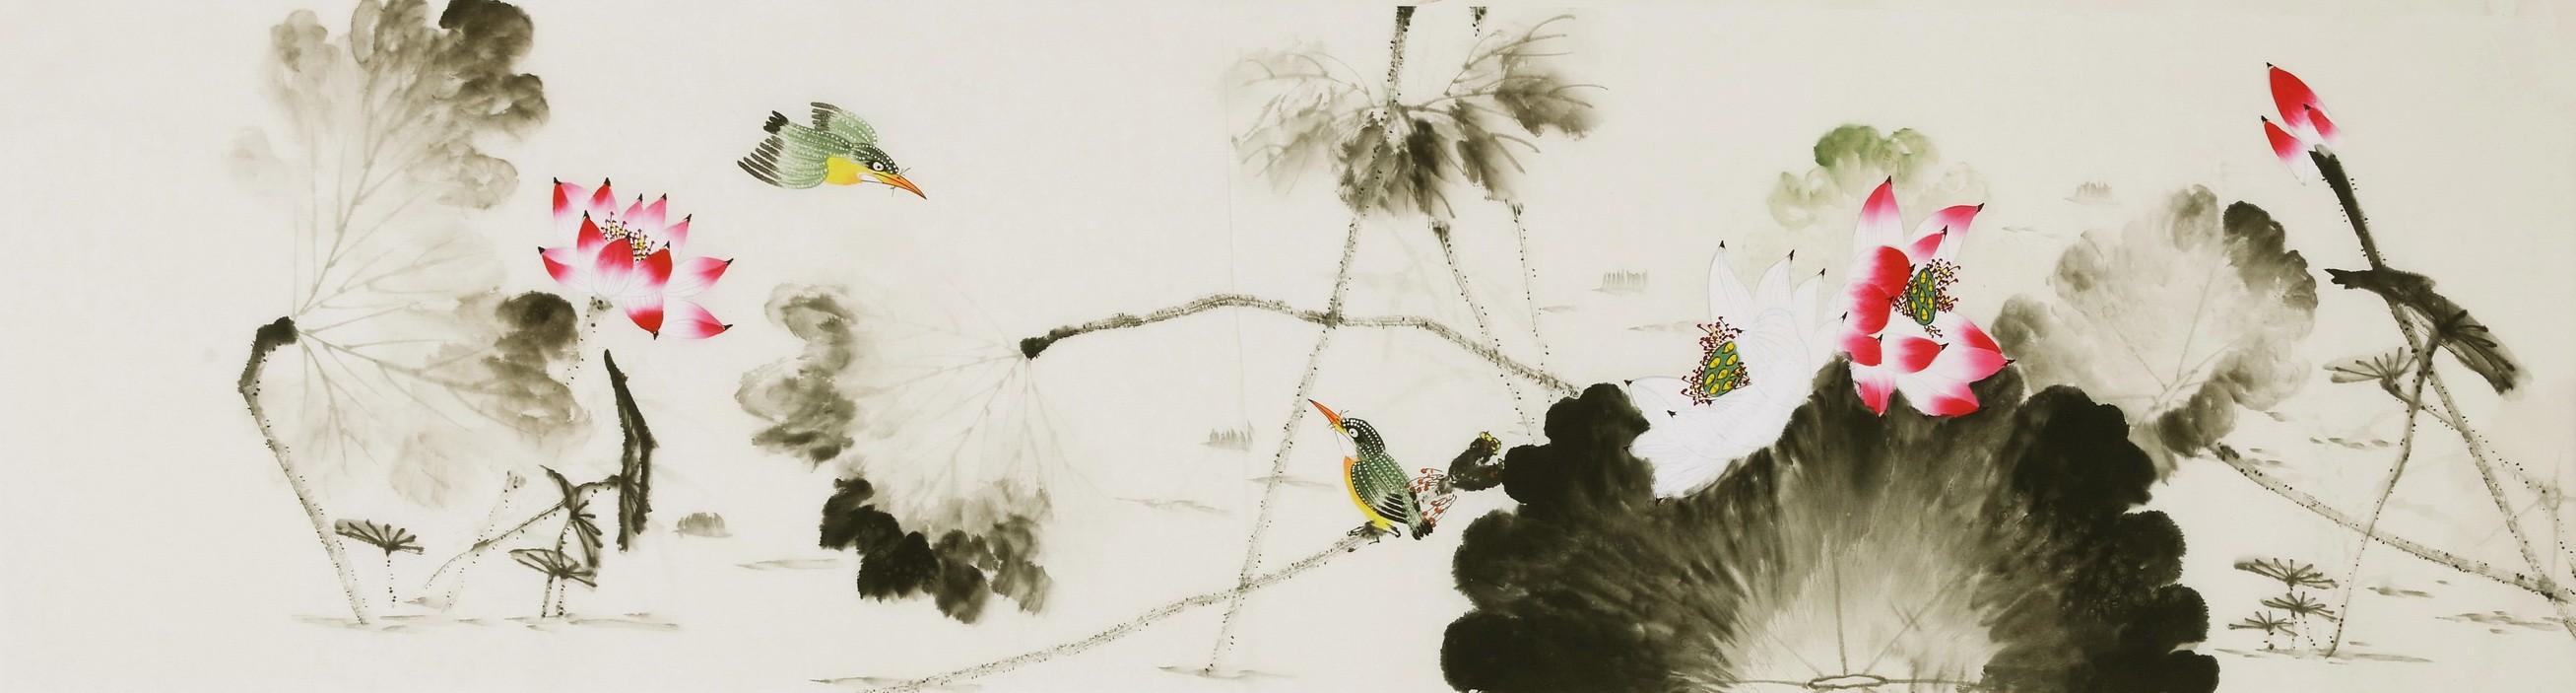 Kingfisher - CNAG004119